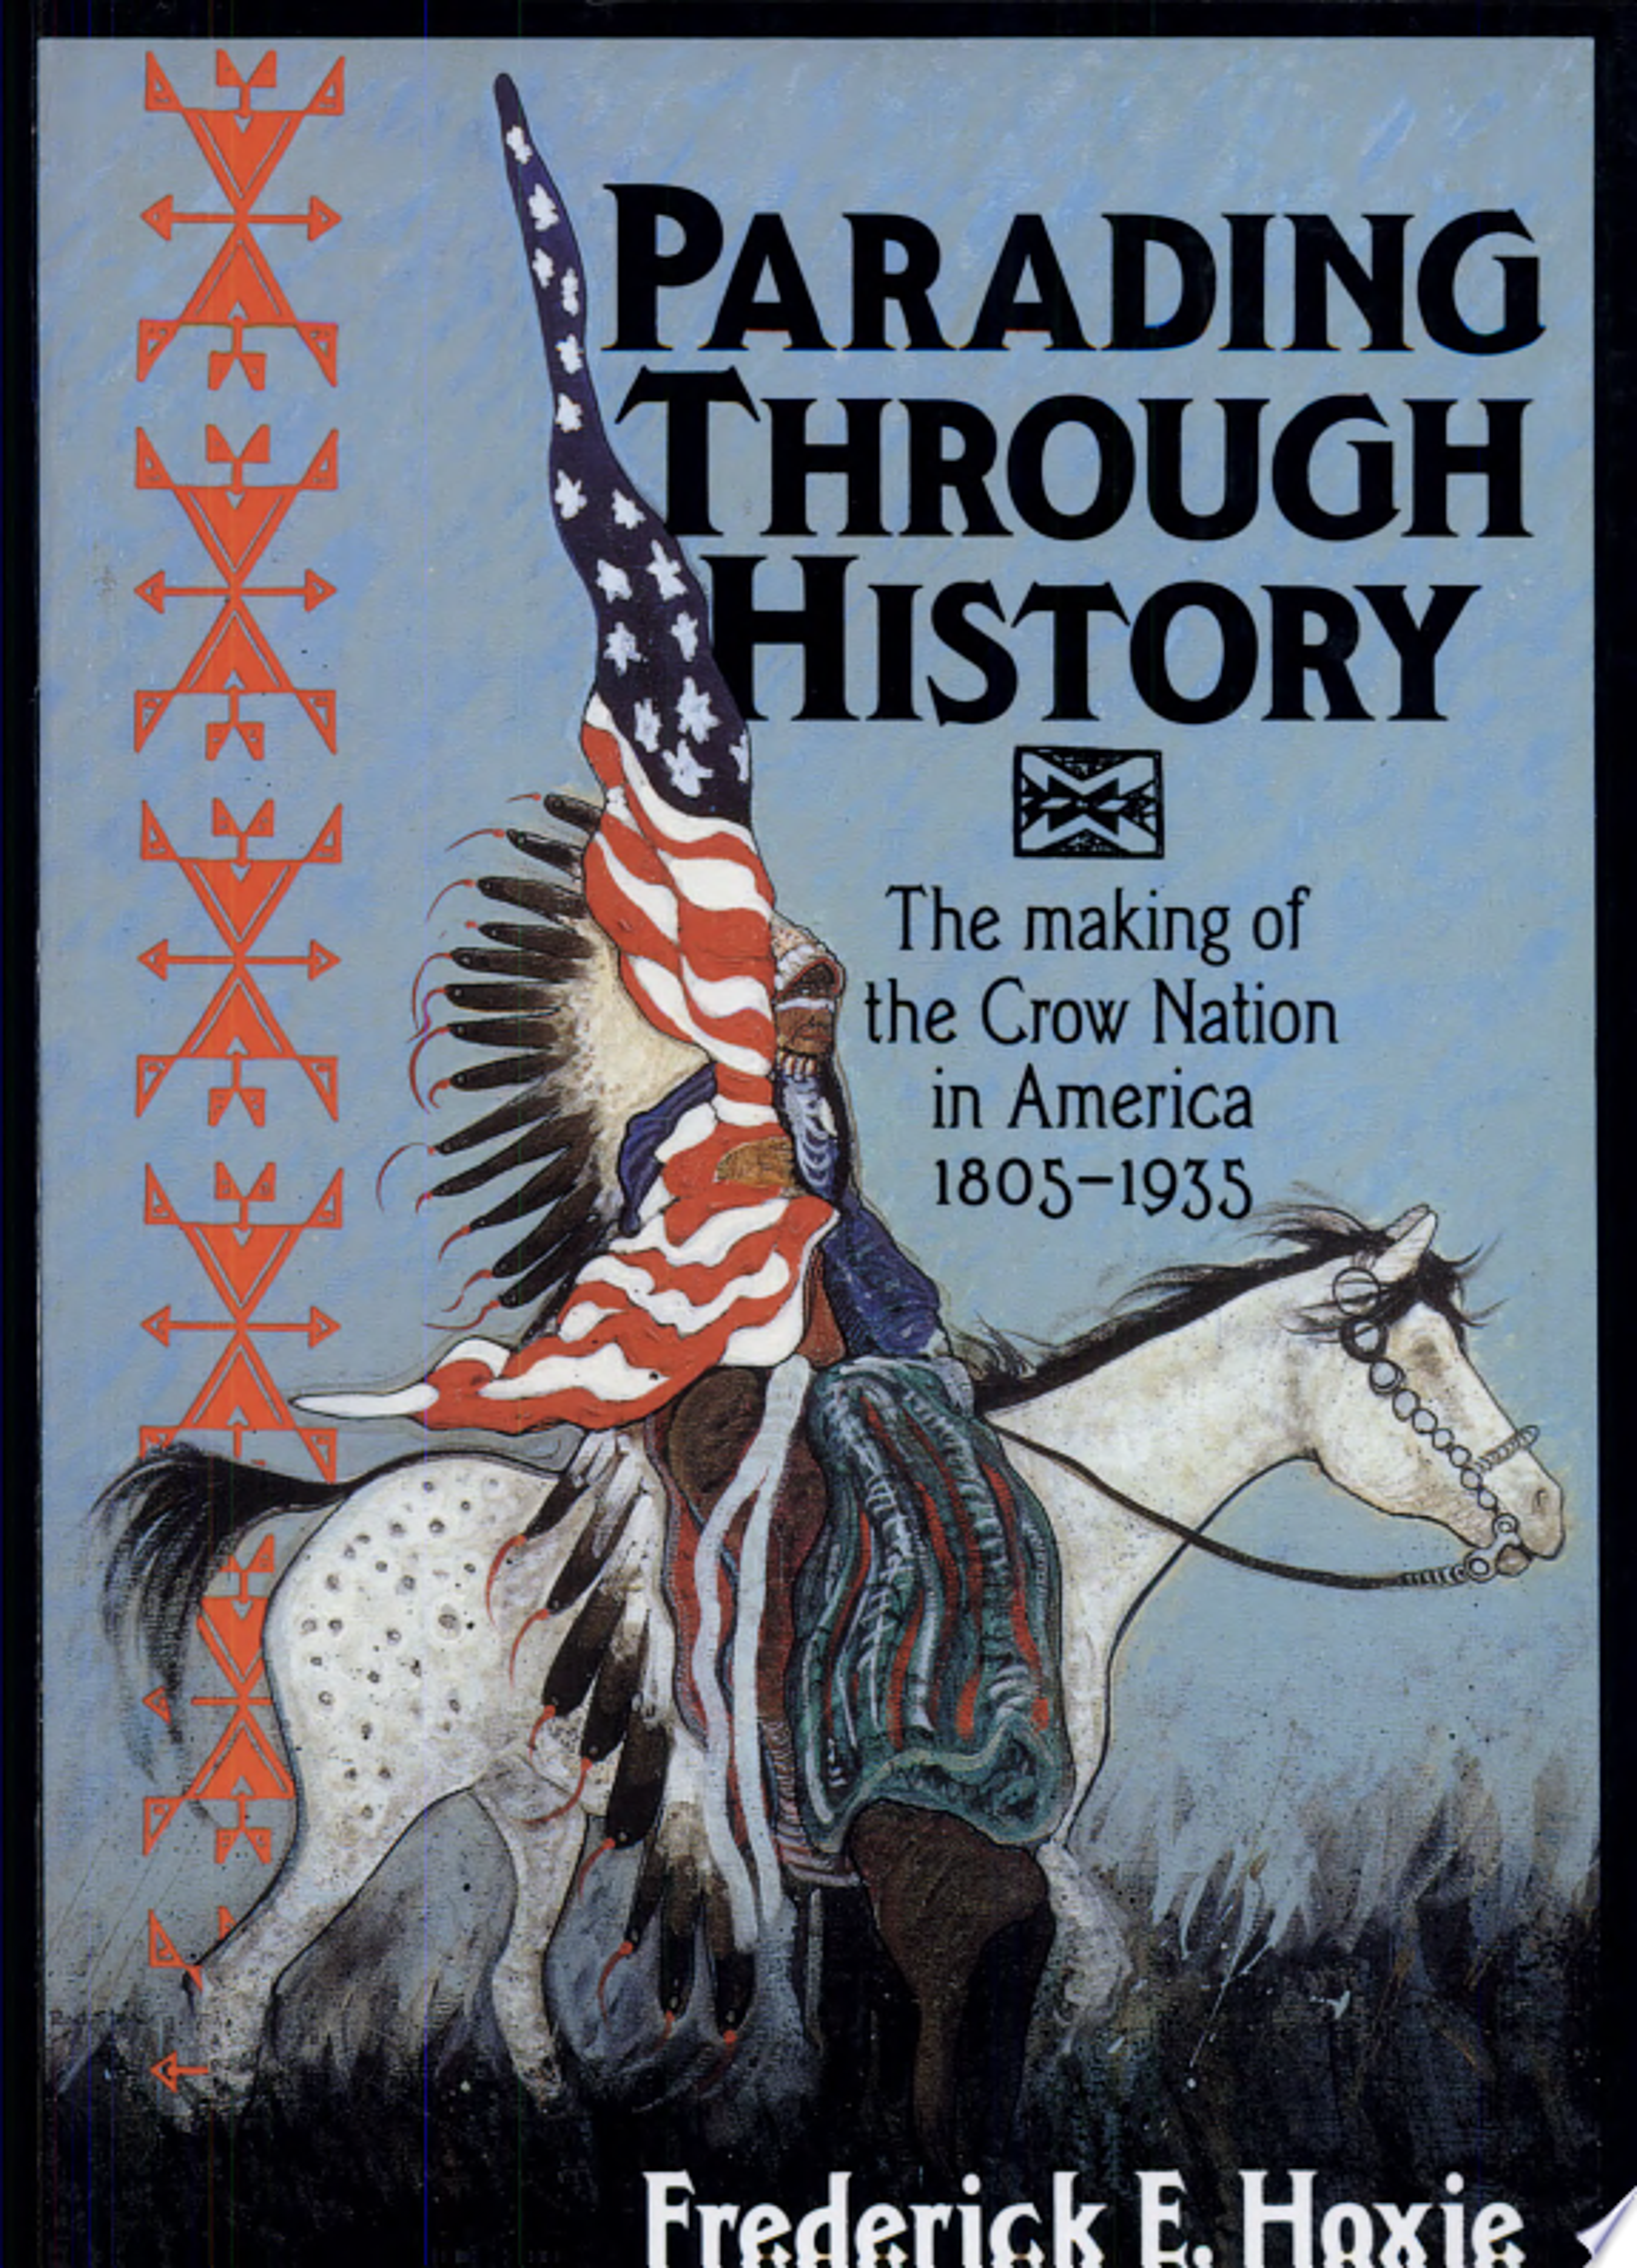 Parading Through History